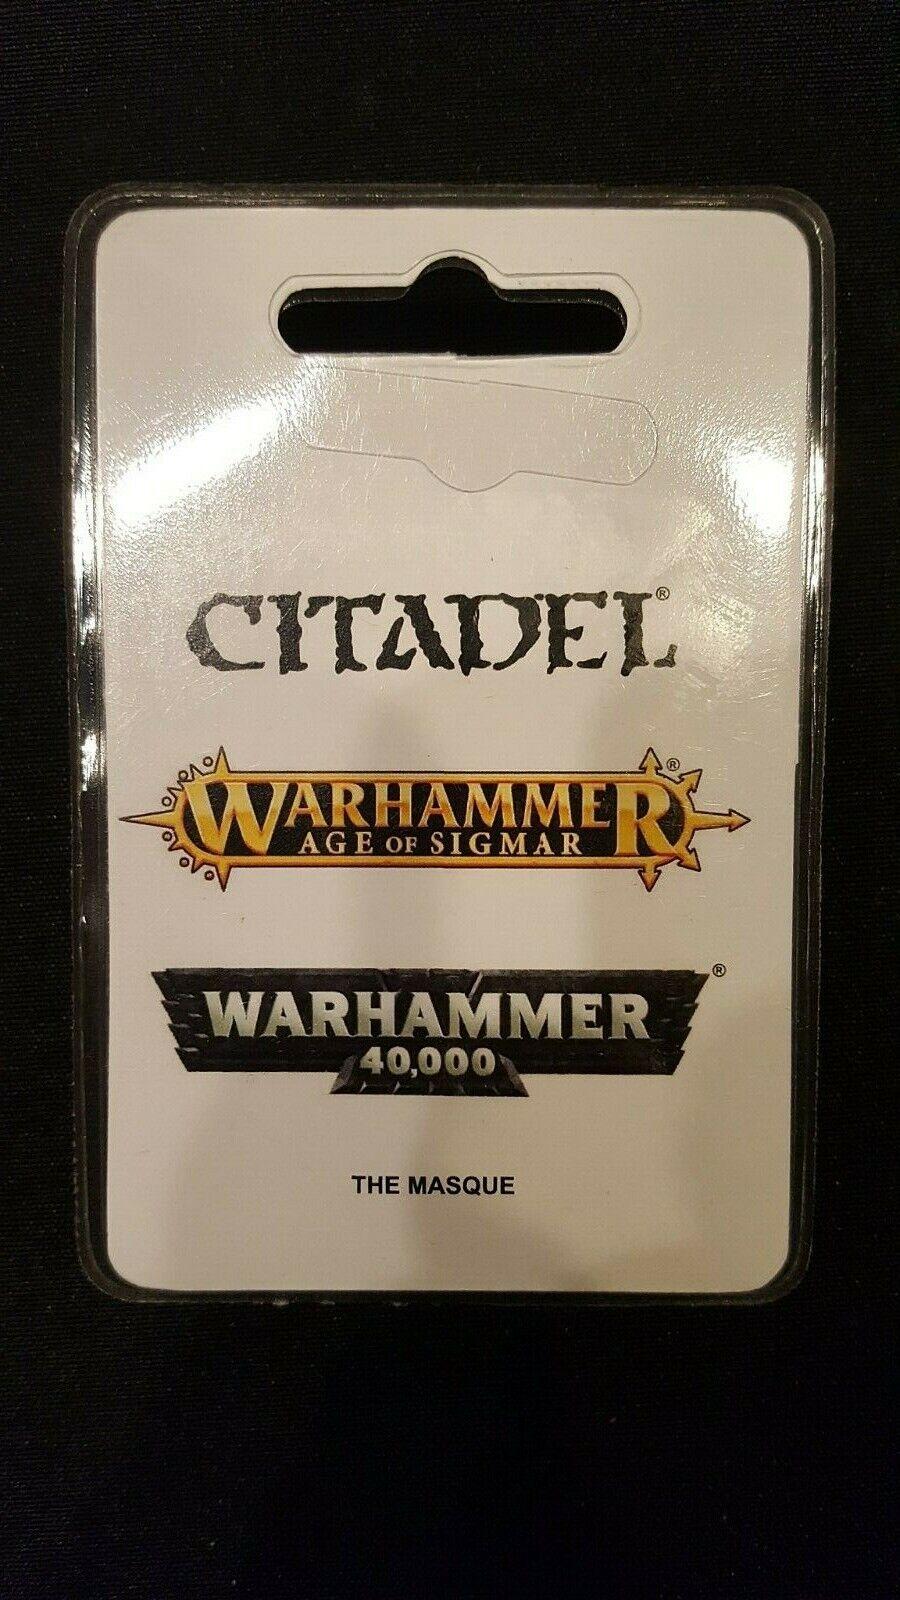 clásico atemporal Warhammer AoS 40k 40k 40k  Chaos Daemons de la másCochea GW Resina Nuevo En Caja  punto de venta